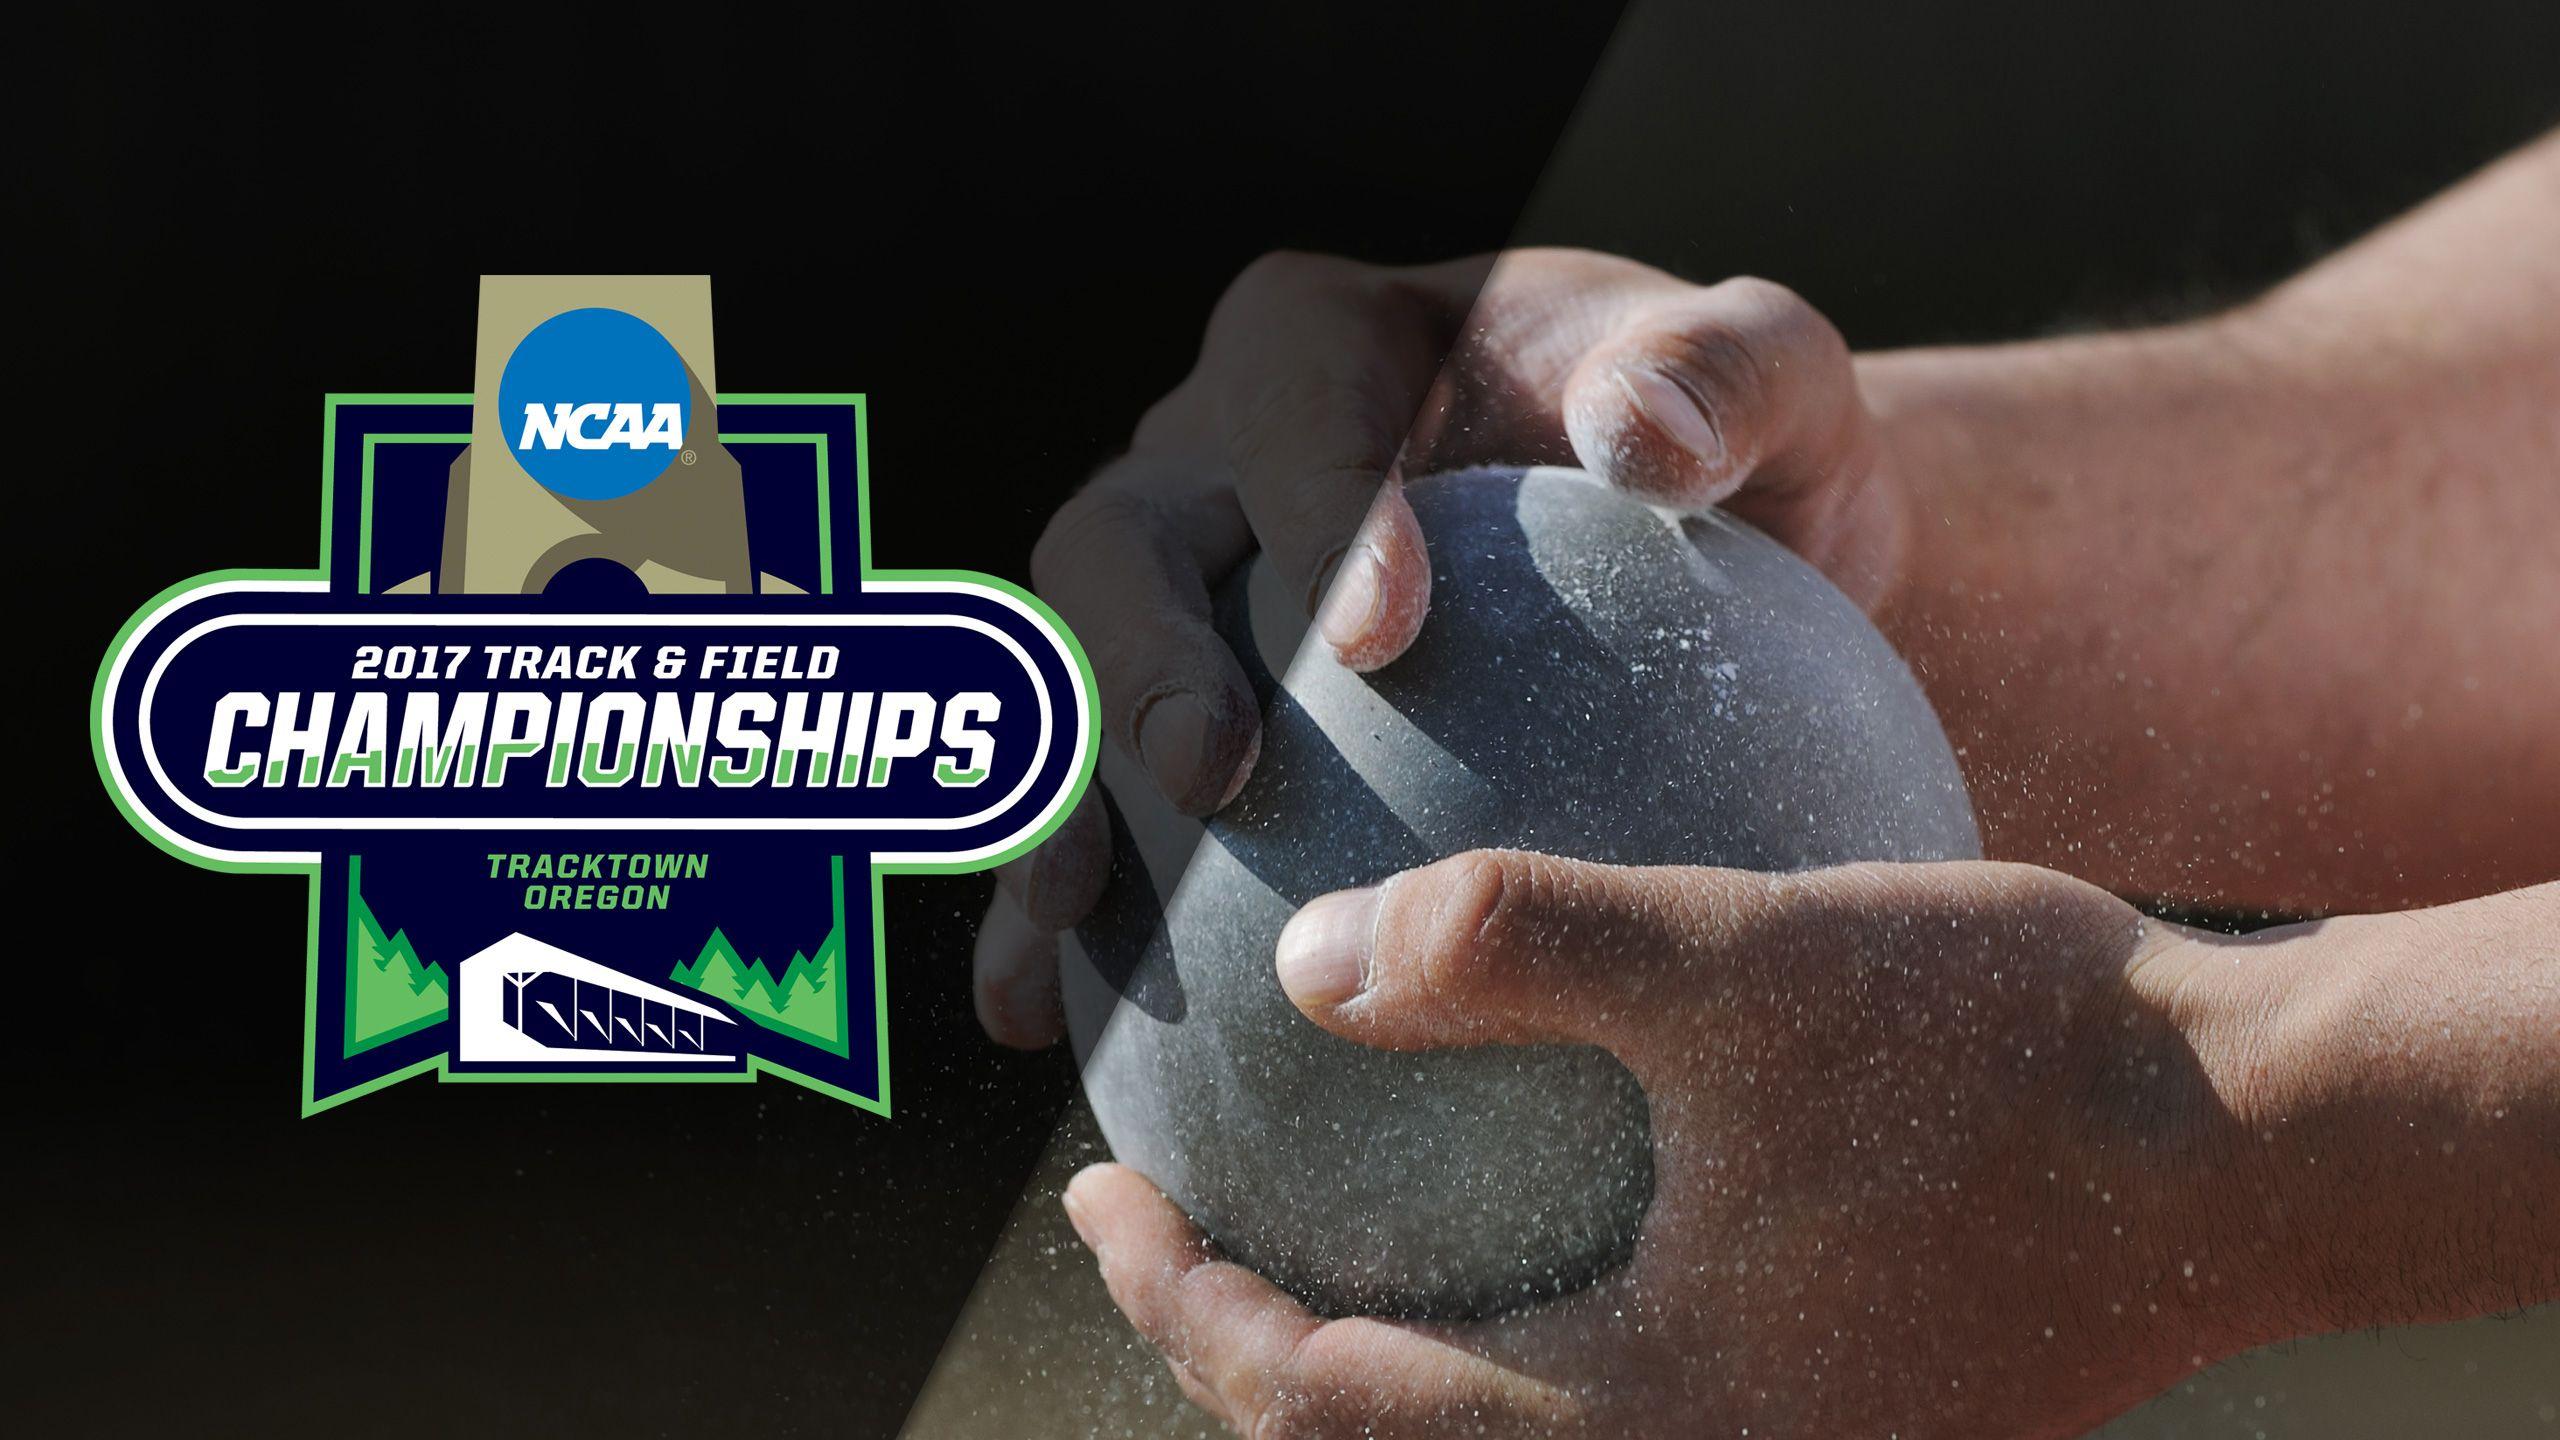 NCAA Track & Field Outdoor Championships - Men's Shot Put Trials (Flight 2) & Final